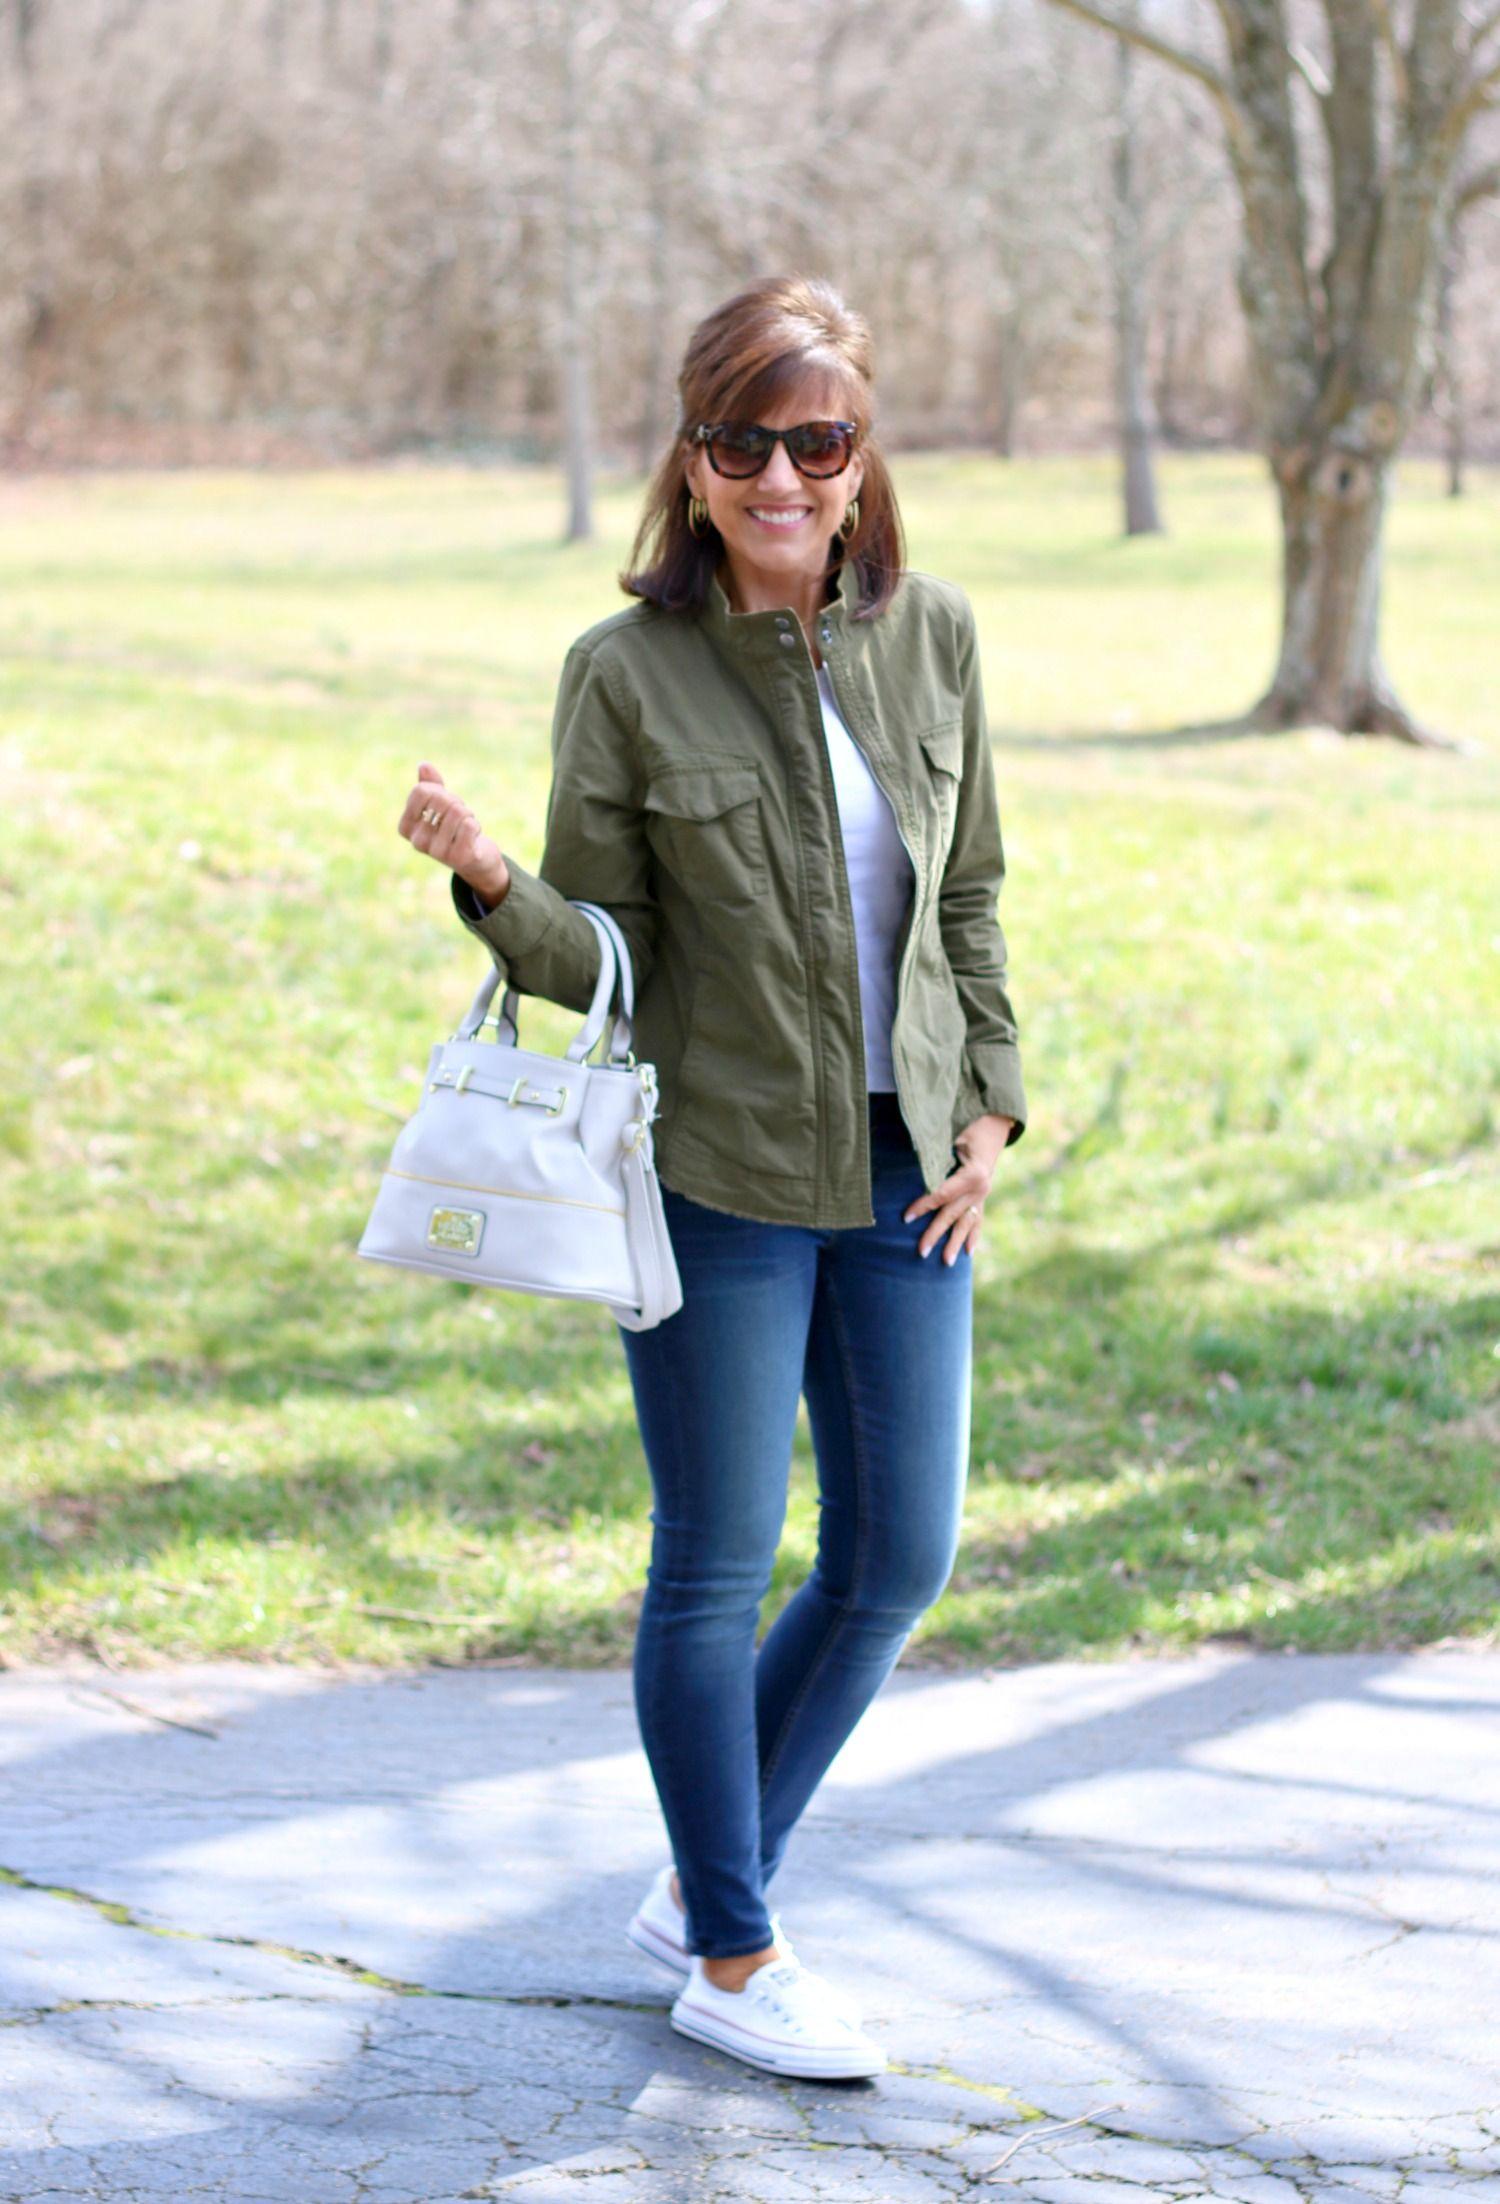 27 Days of Spring Fashion: Utility Jacket - Cyndi